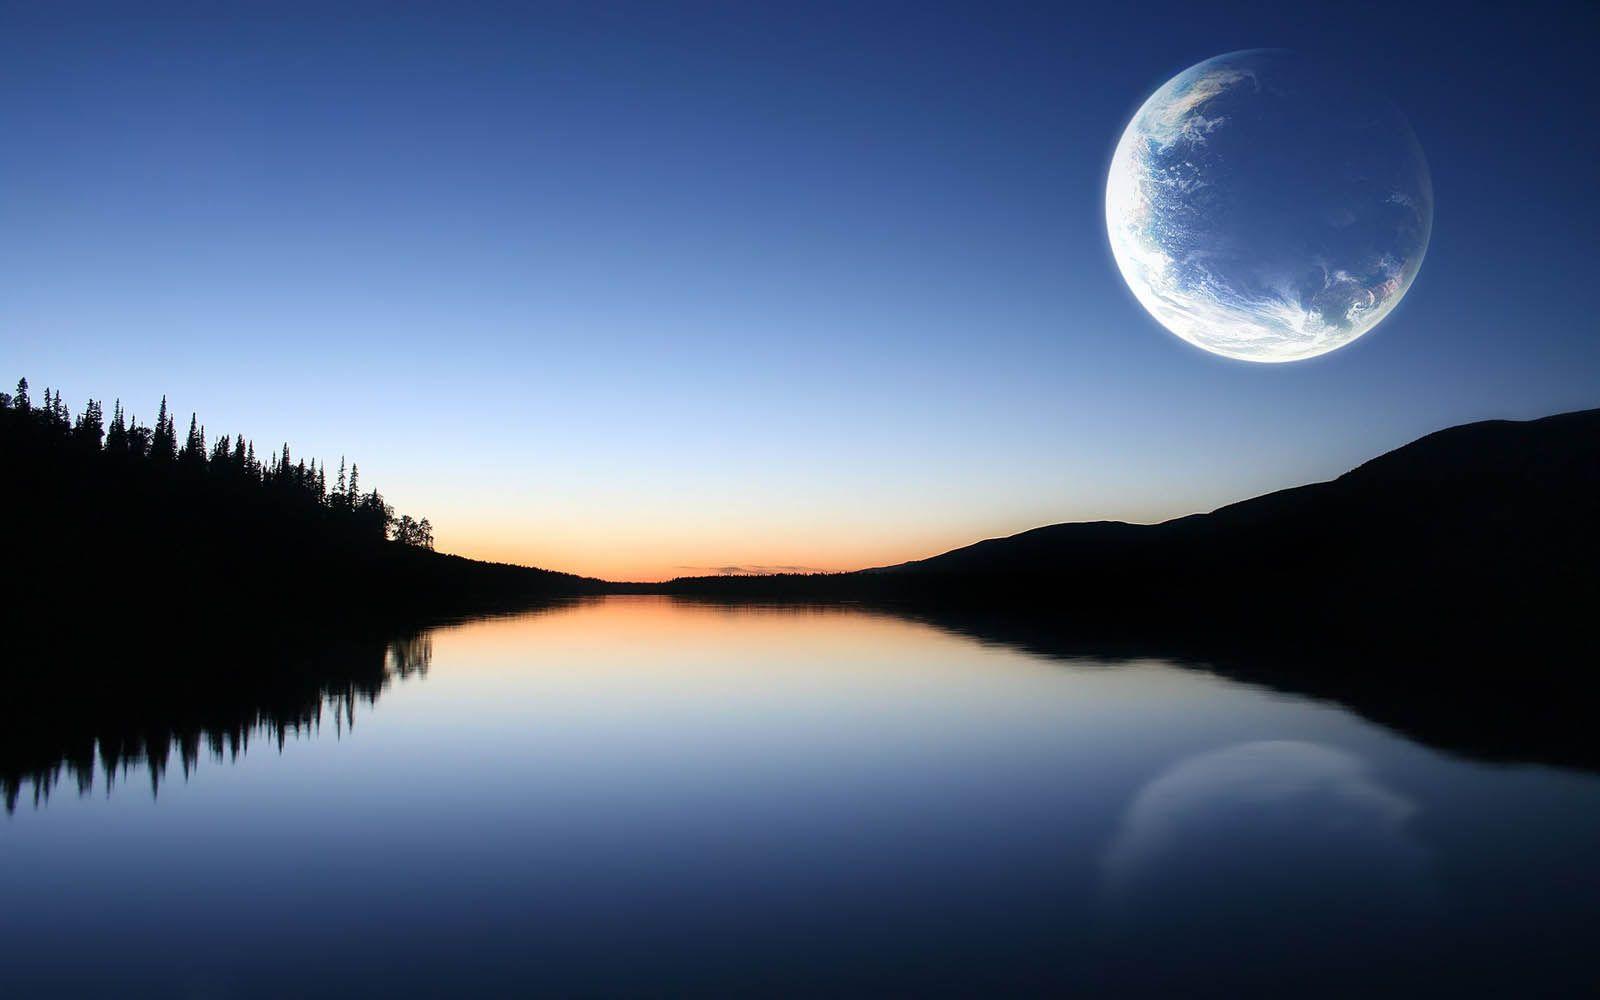 Pin by Maria Contreiras on Sun and Moon Pinterest Moon